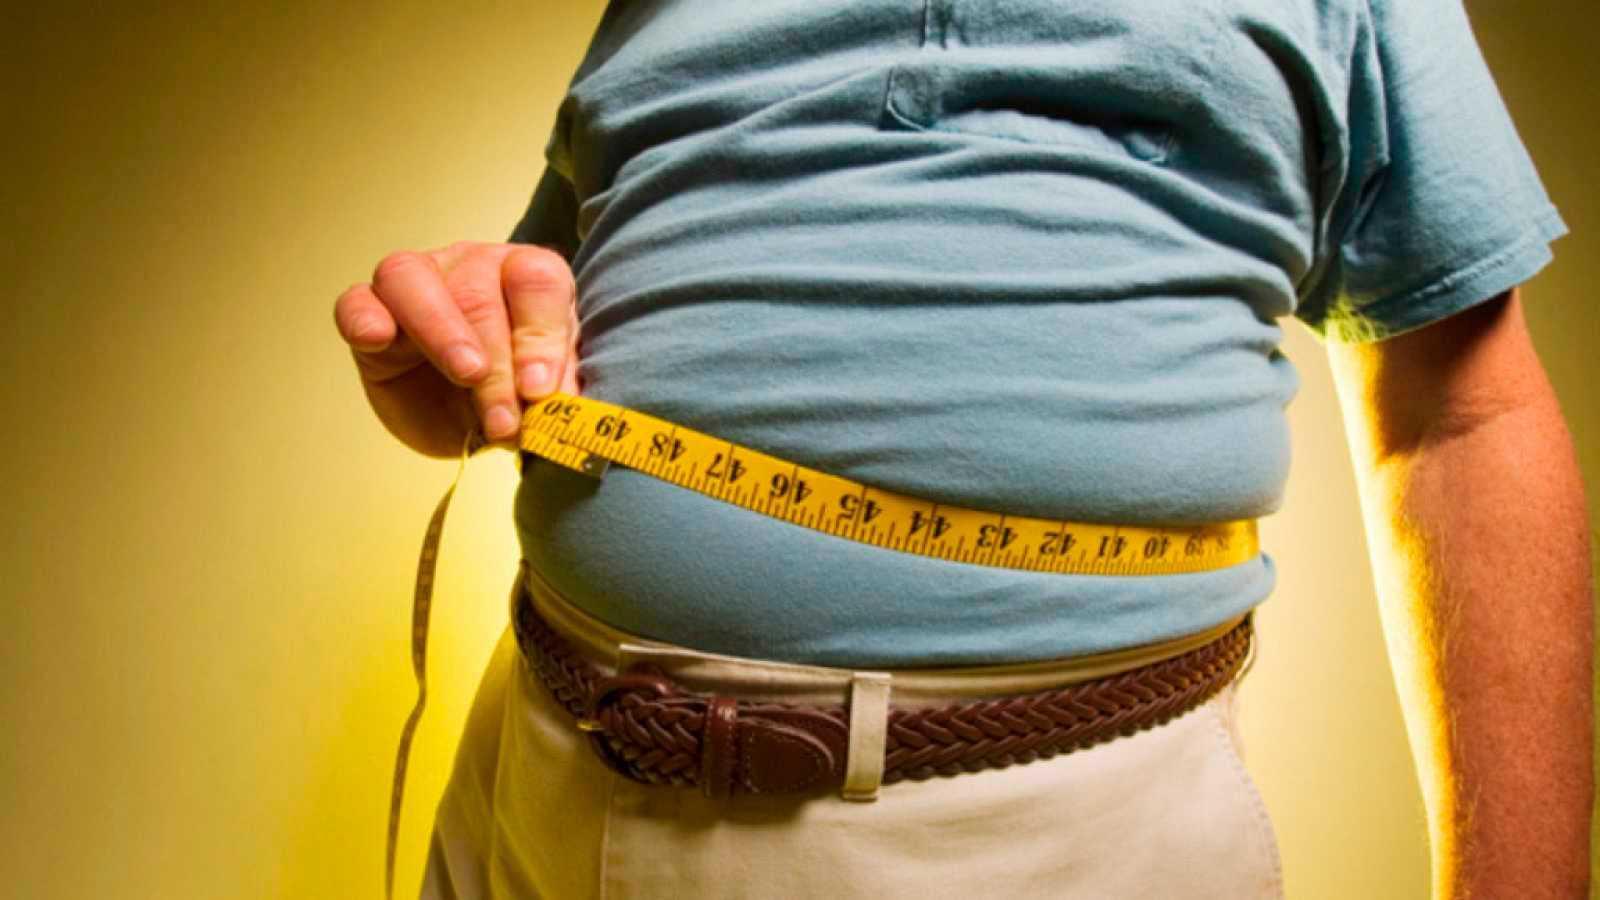 Obesidad, la pandemia del siglo XXI